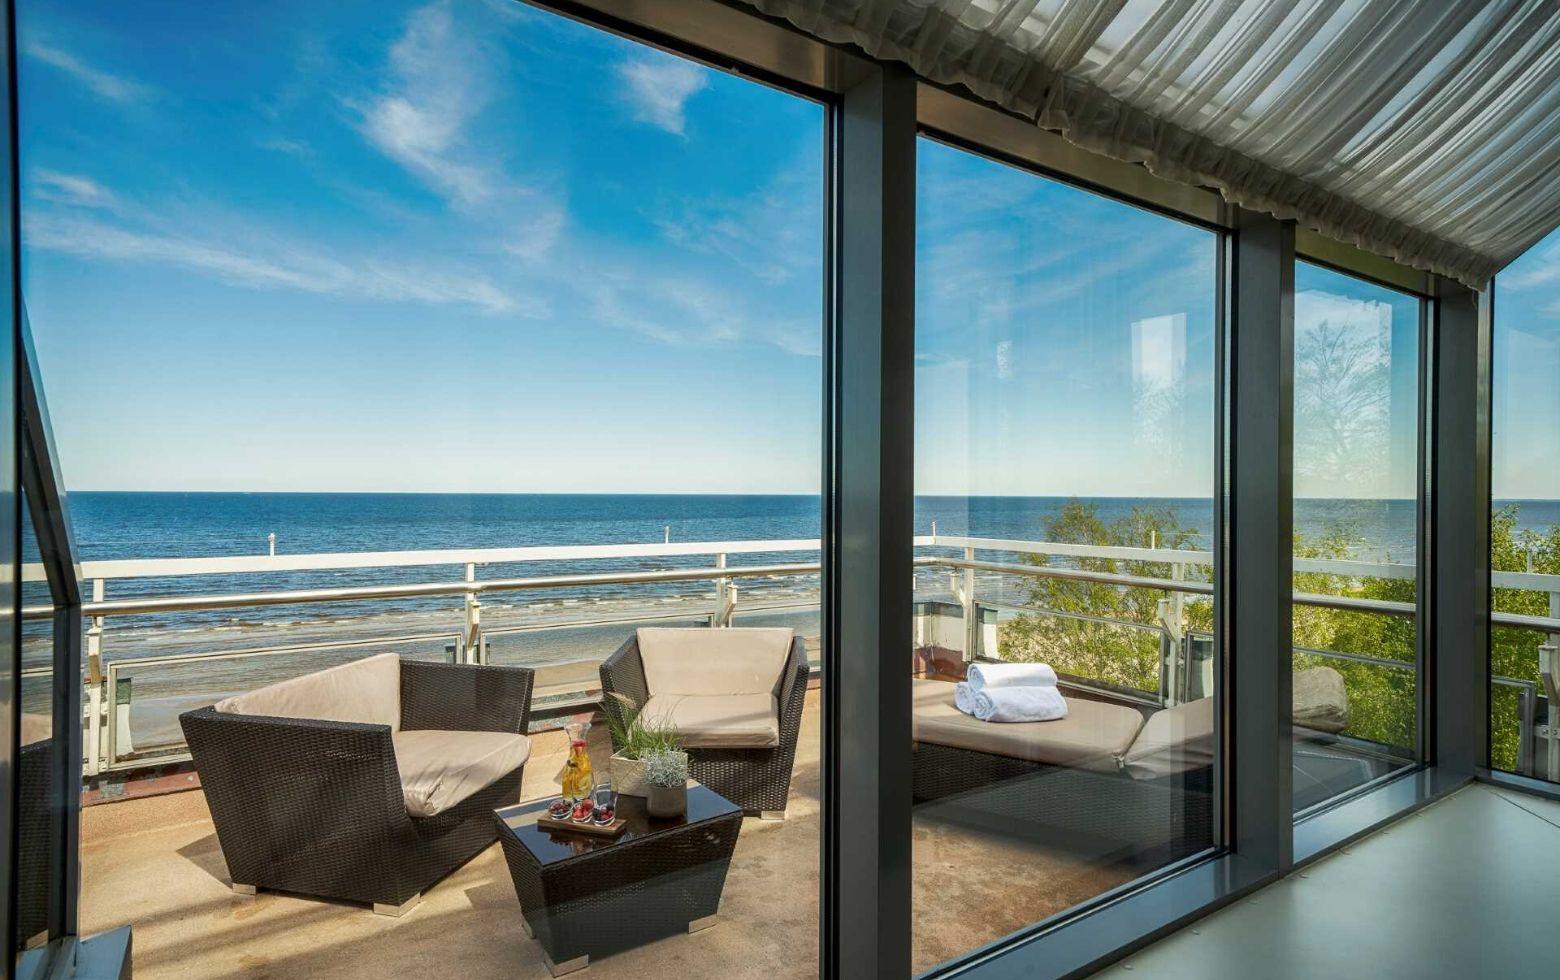 gospa-viesnicas-gal-baltic-beach-hotel4